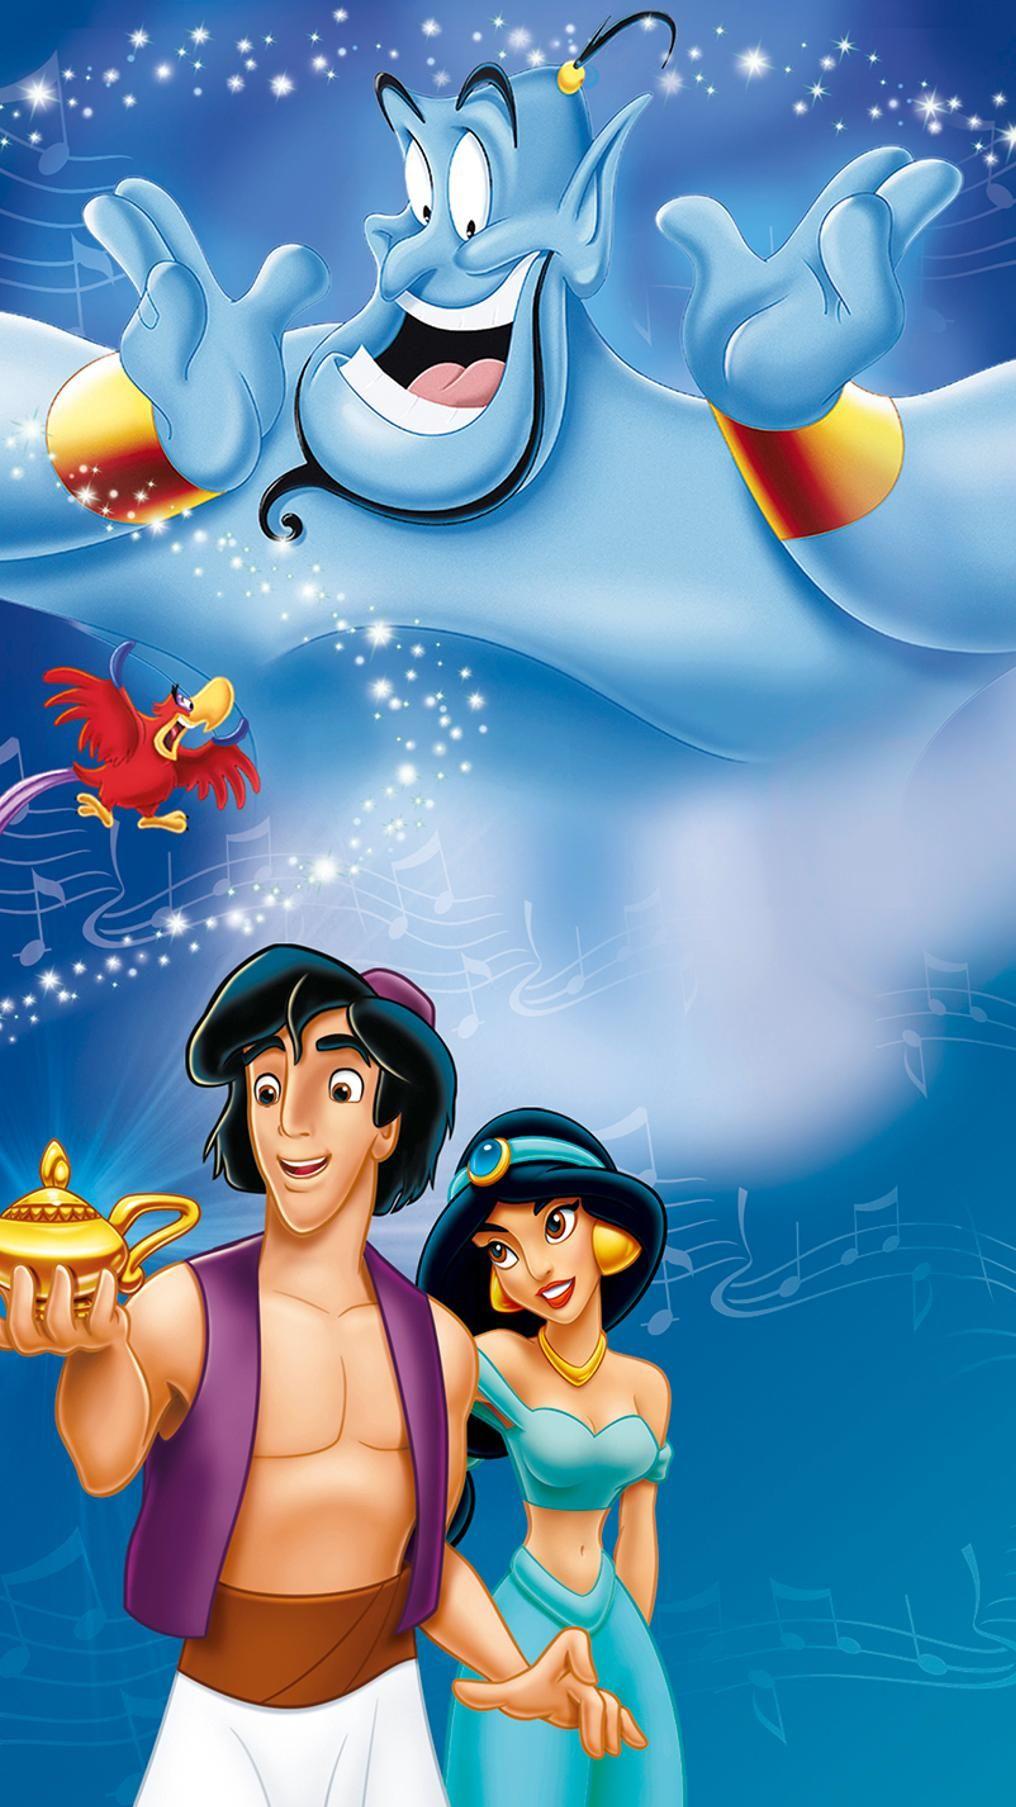 Aladdin 1992 Phone Wallpaper Moviemania Aladdin Wallpaper Aladdin Movie Disney